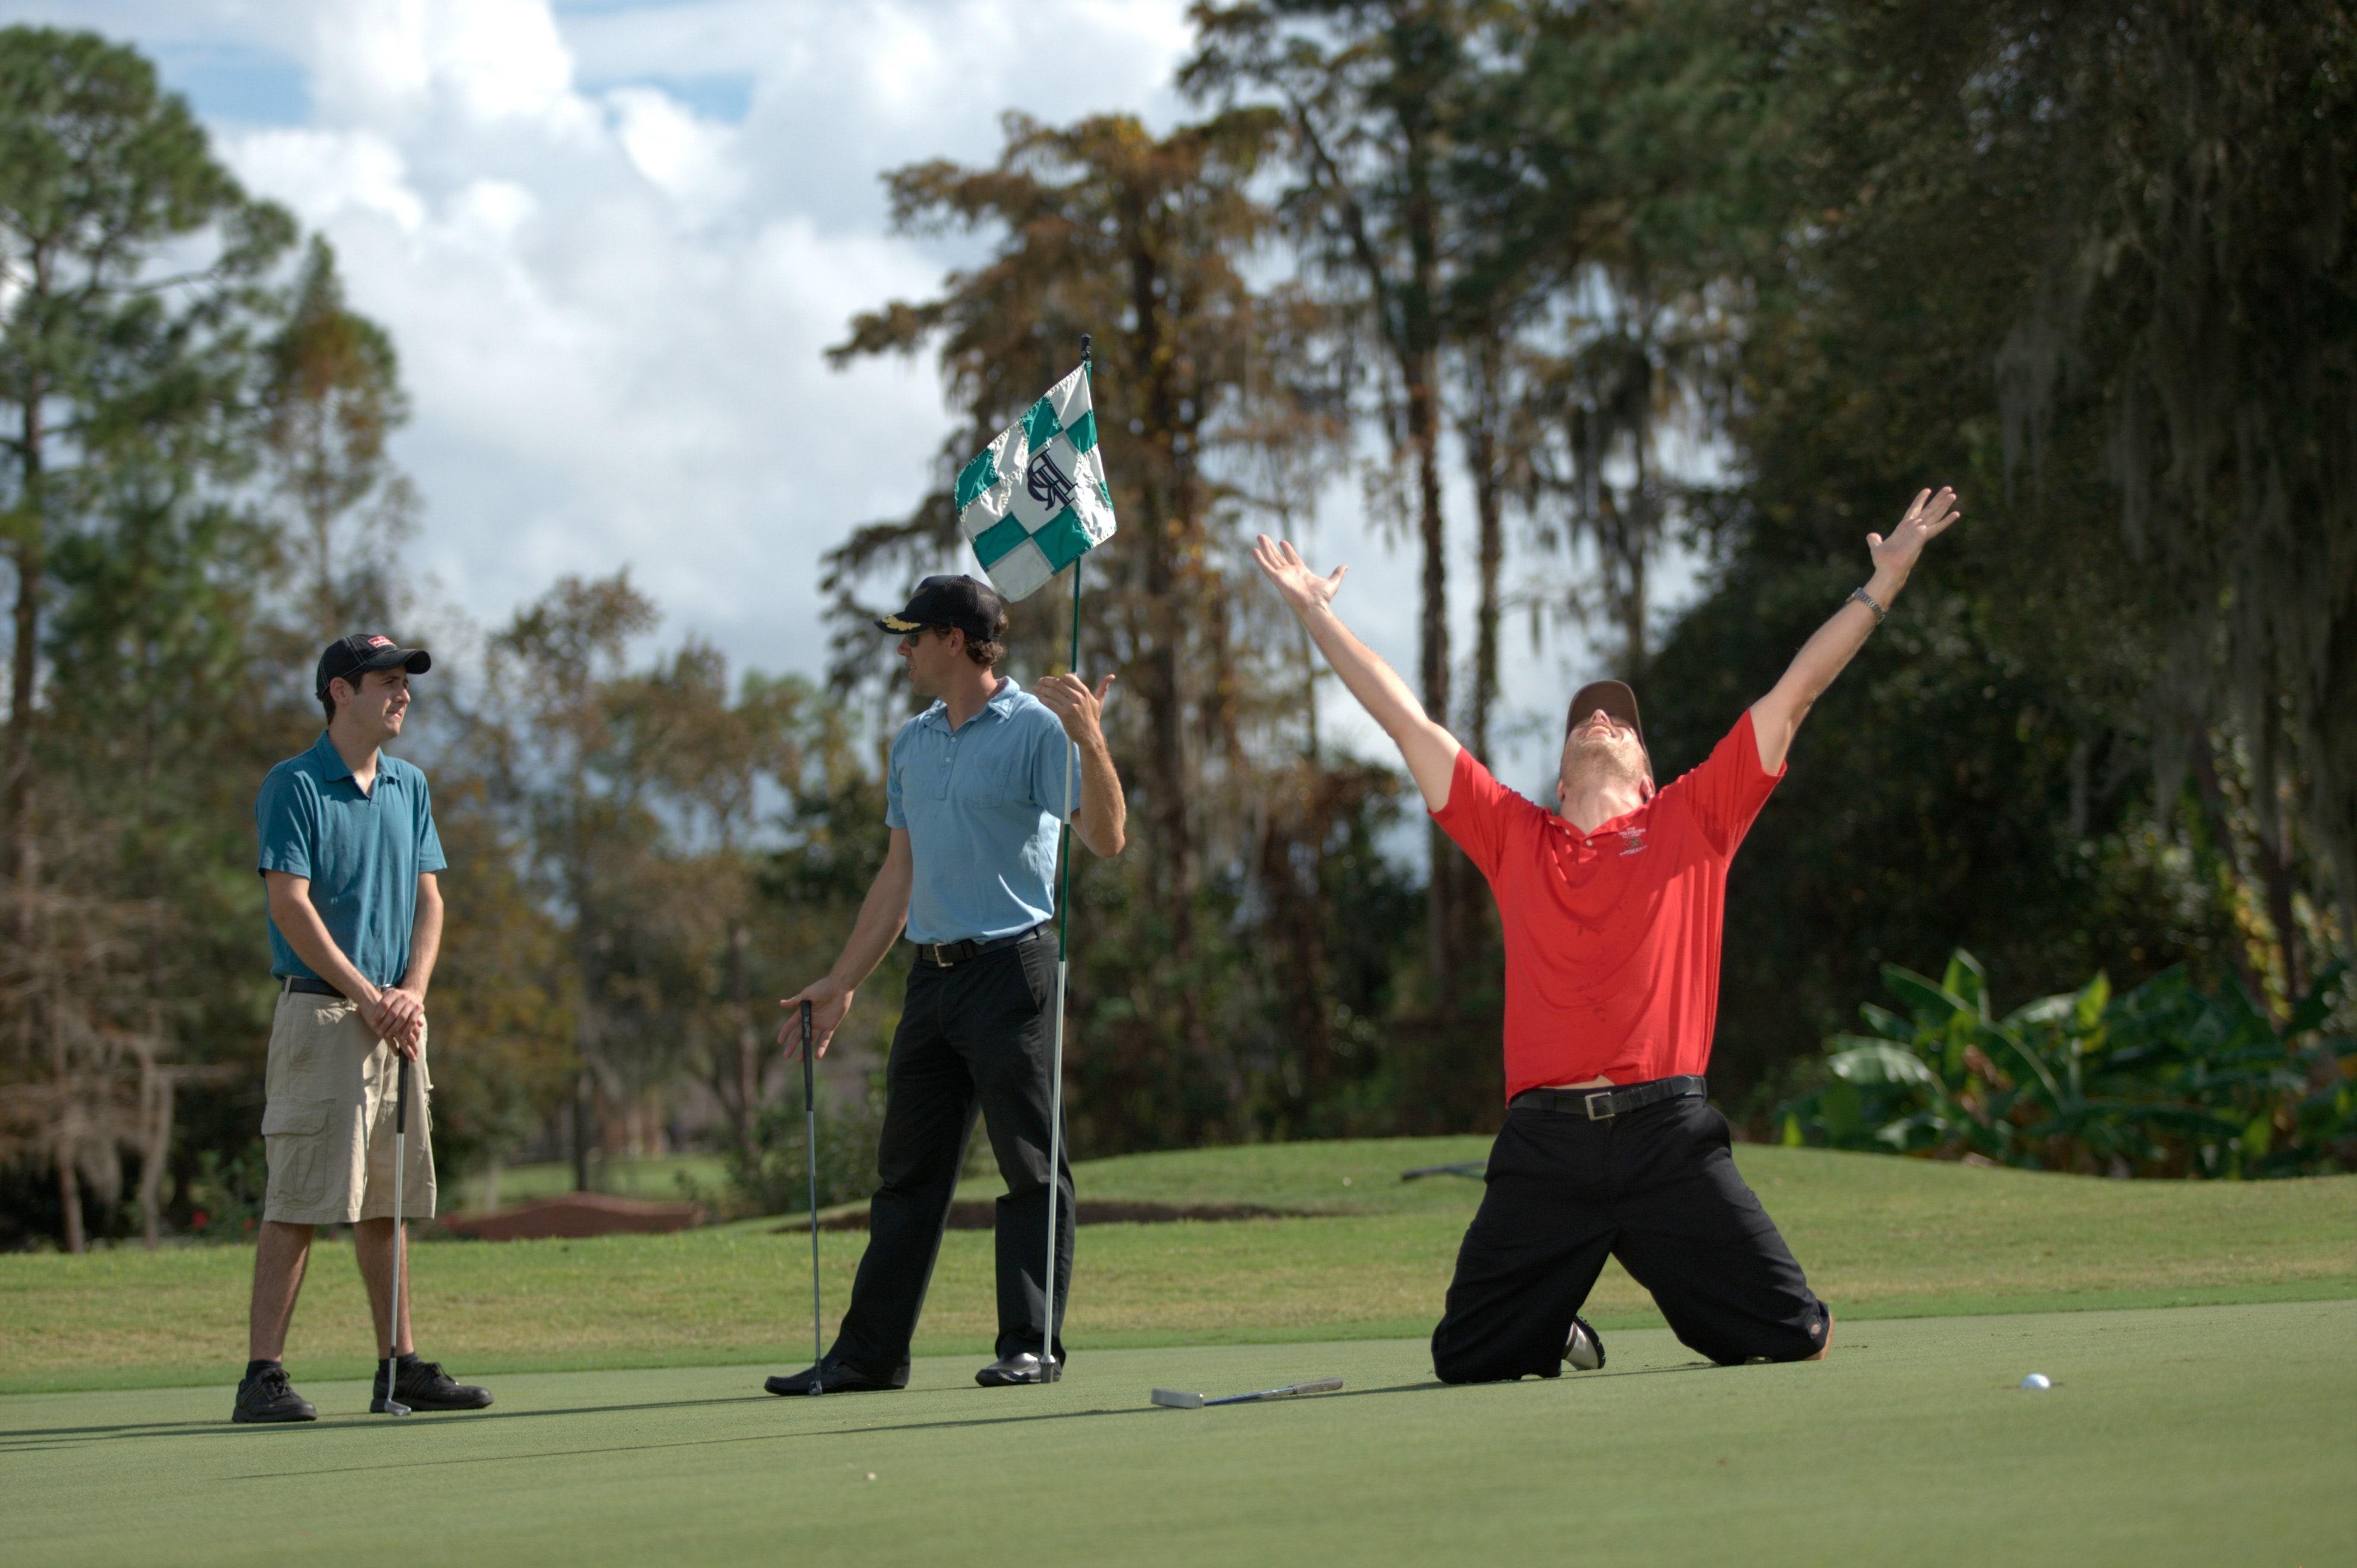 Análisis del compañero de golf ideal: ¿Lo eres?